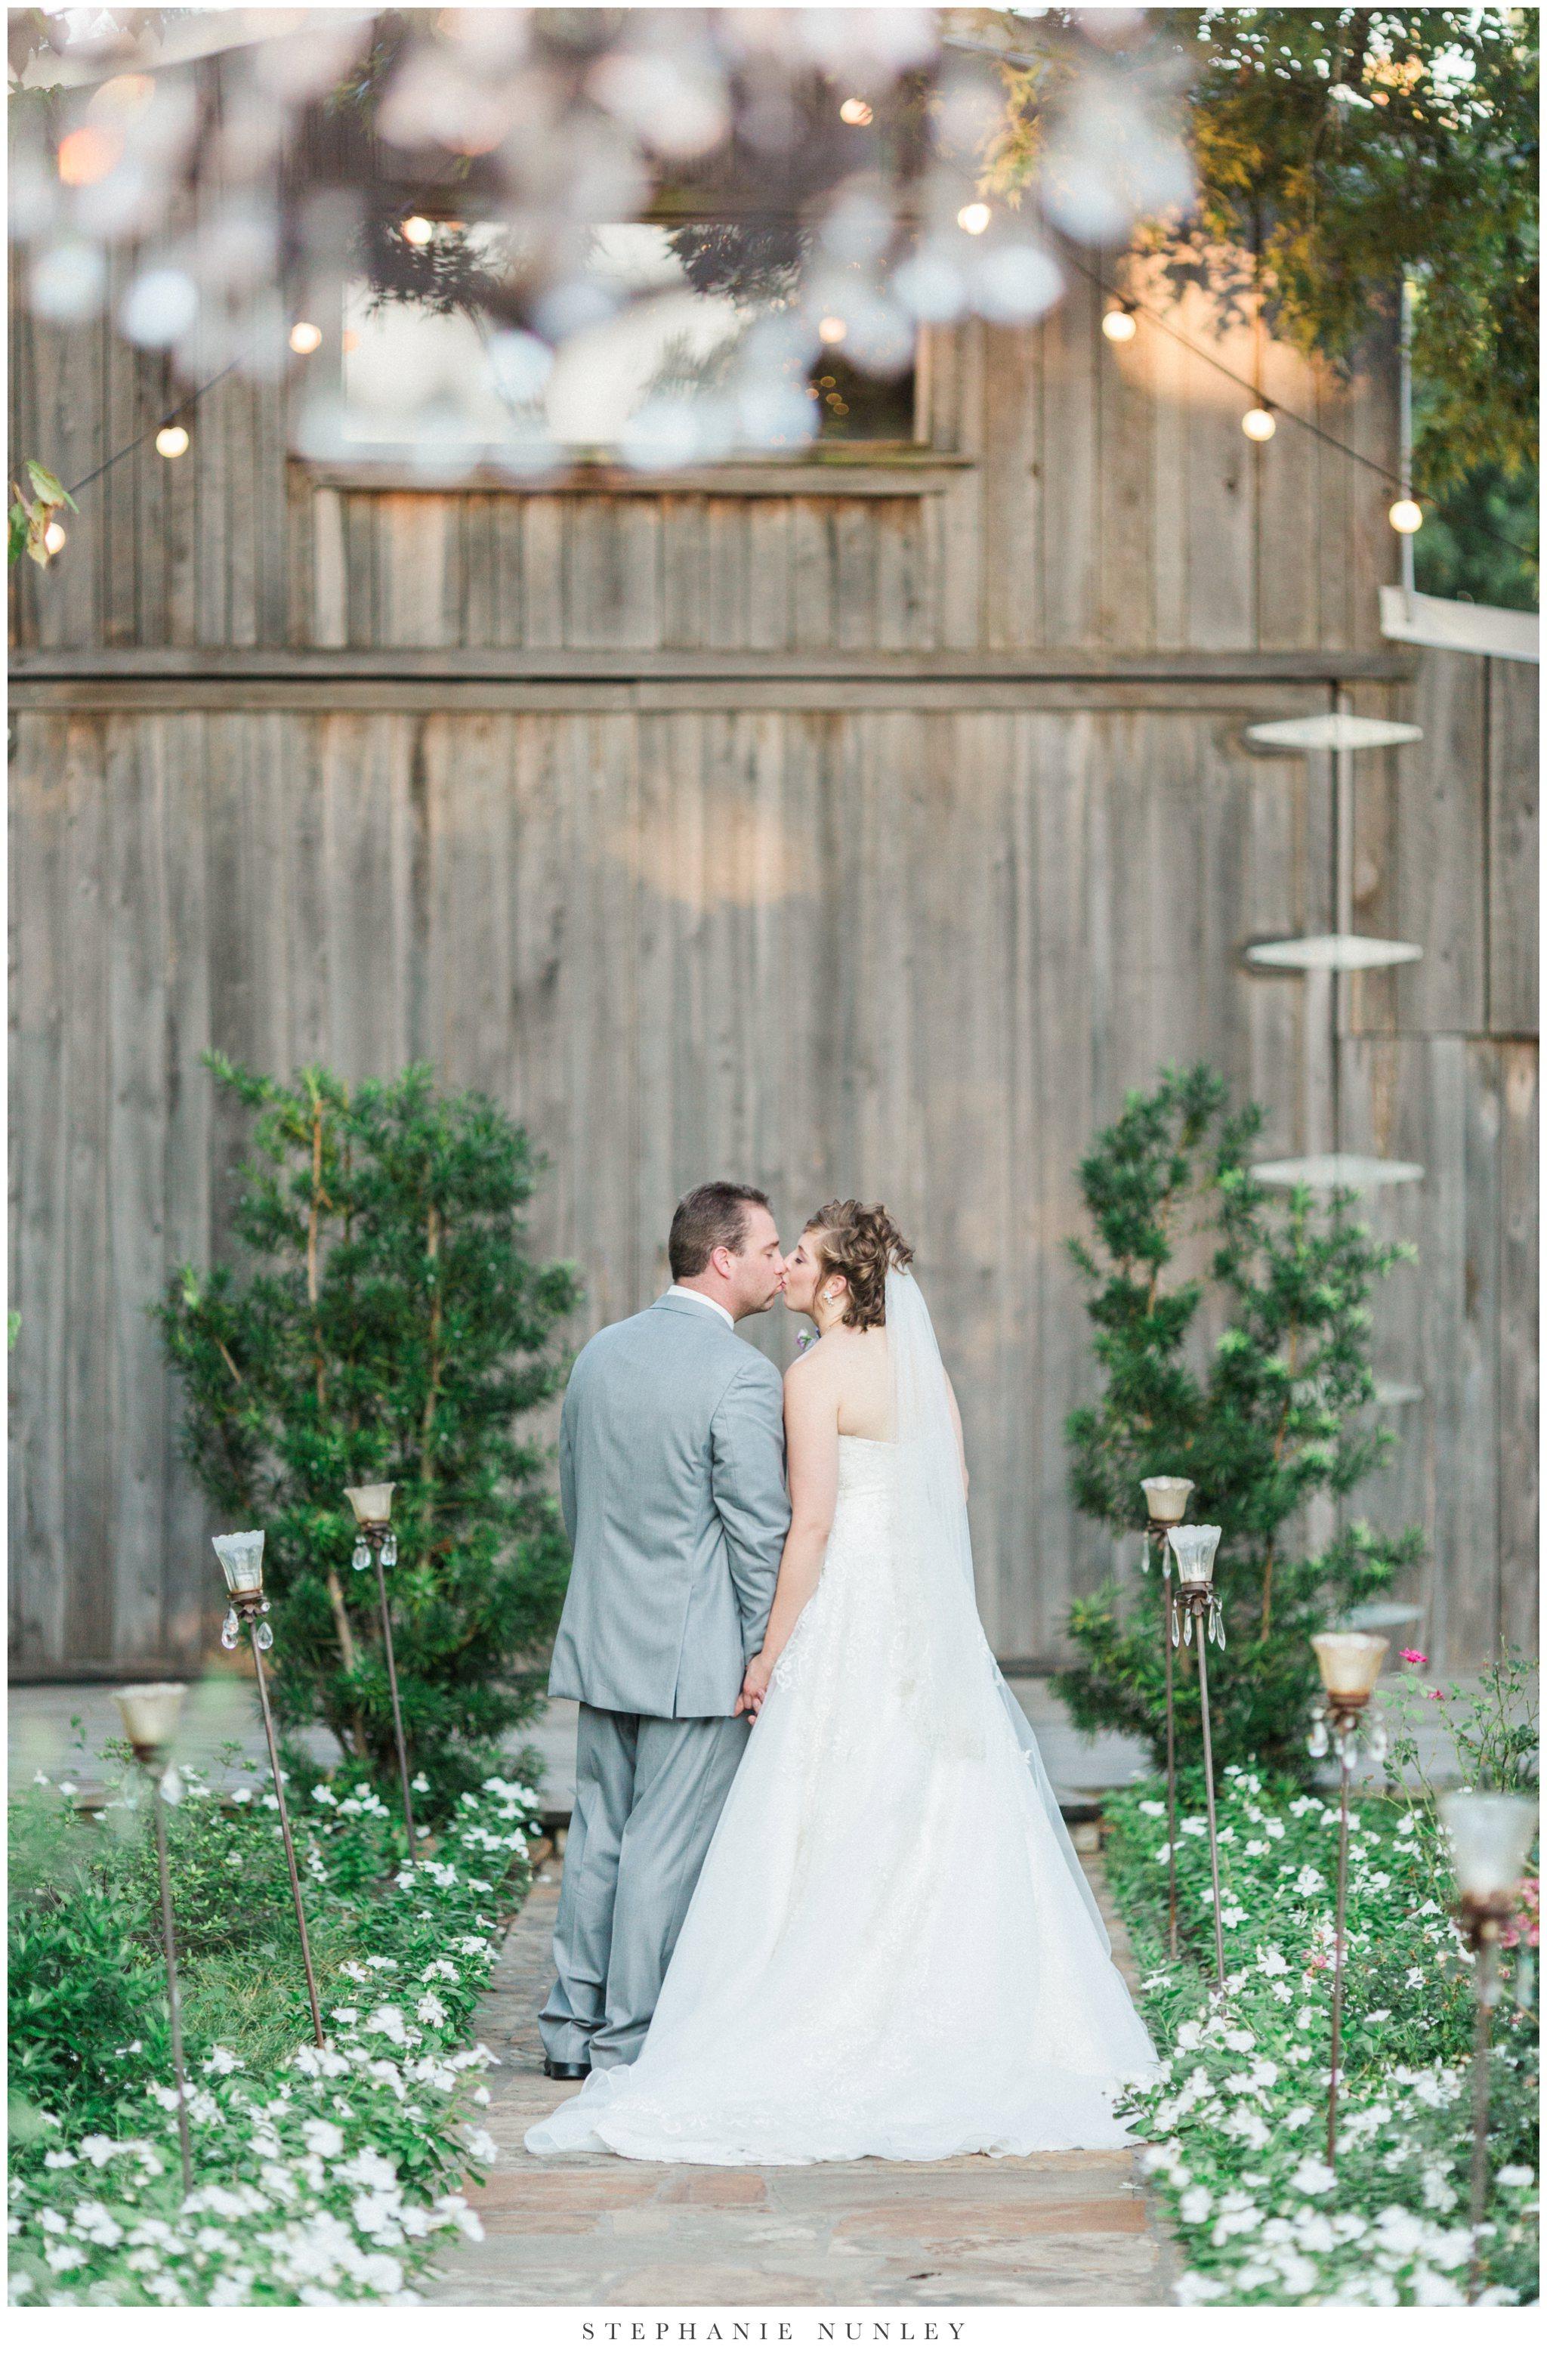 southern-classy-outdoor-barn-wedding-photos-0001-2.jpg